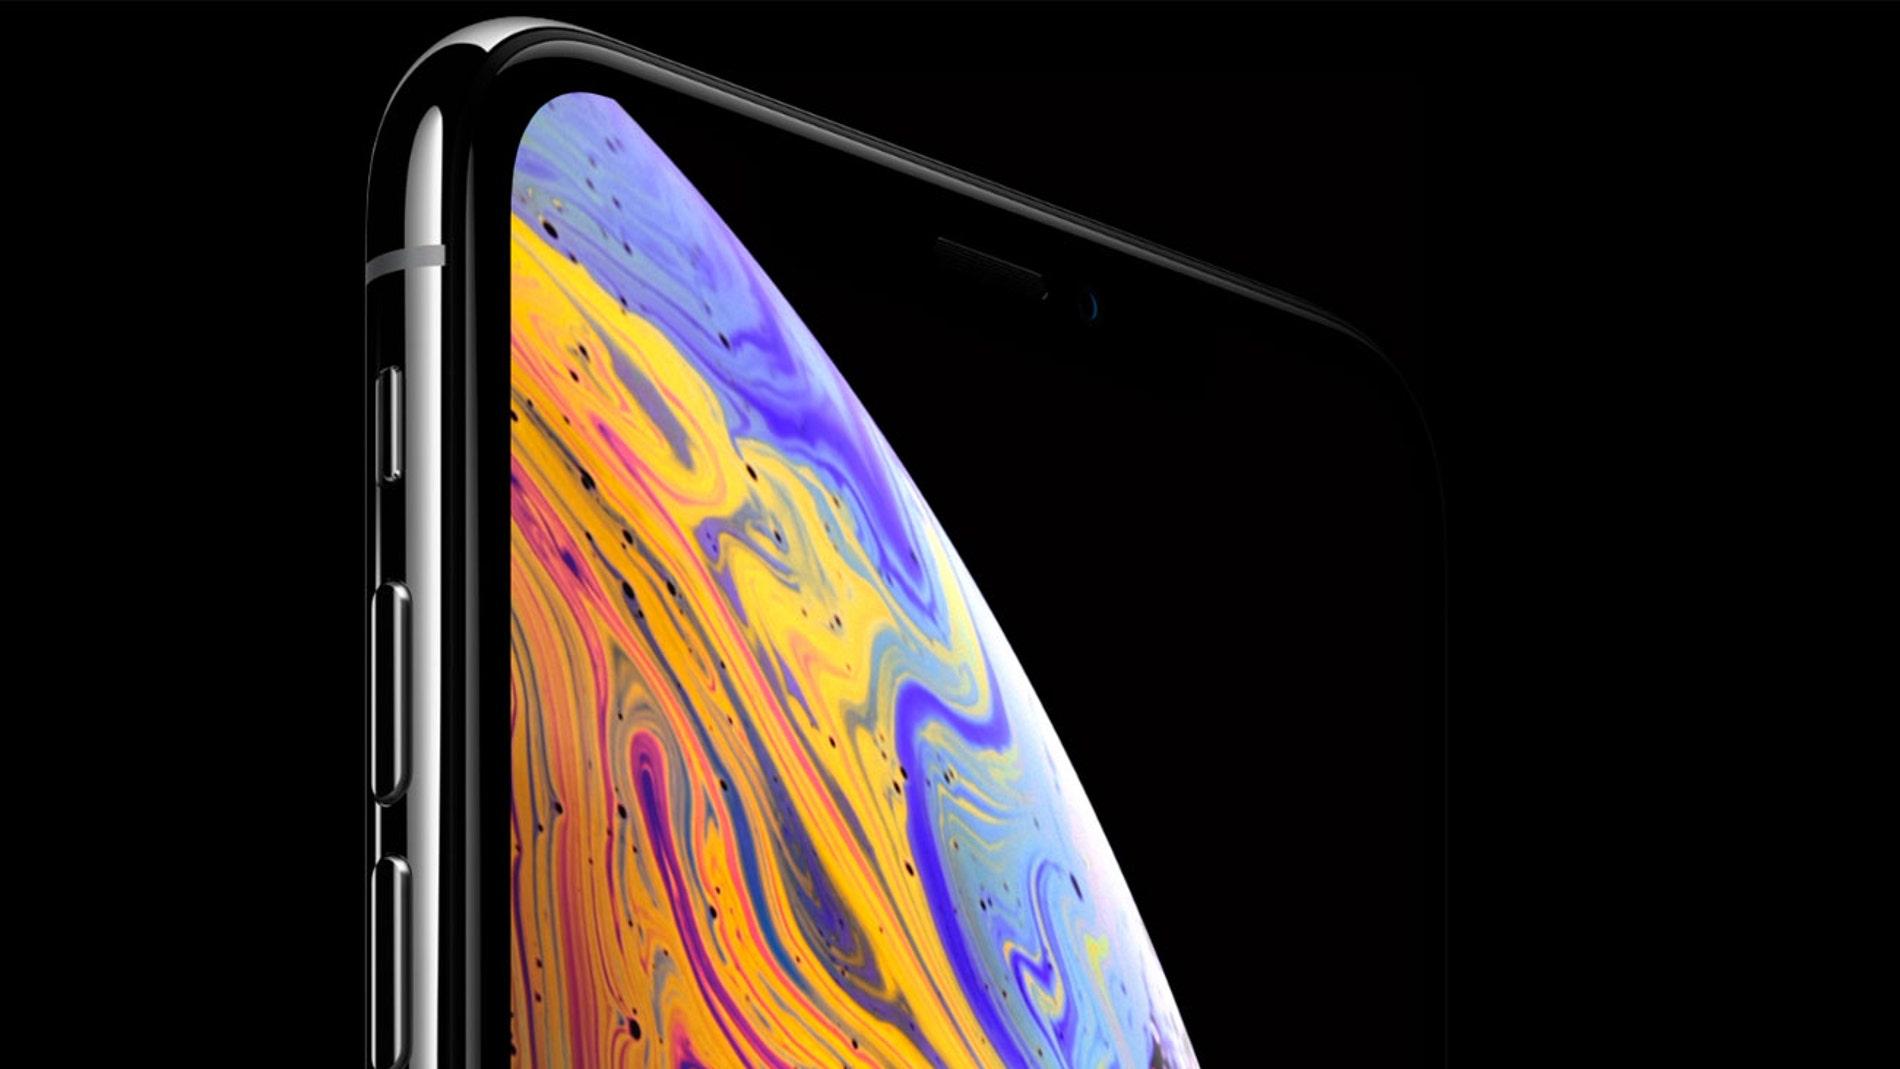 El iPhone XS con pantalla OLED